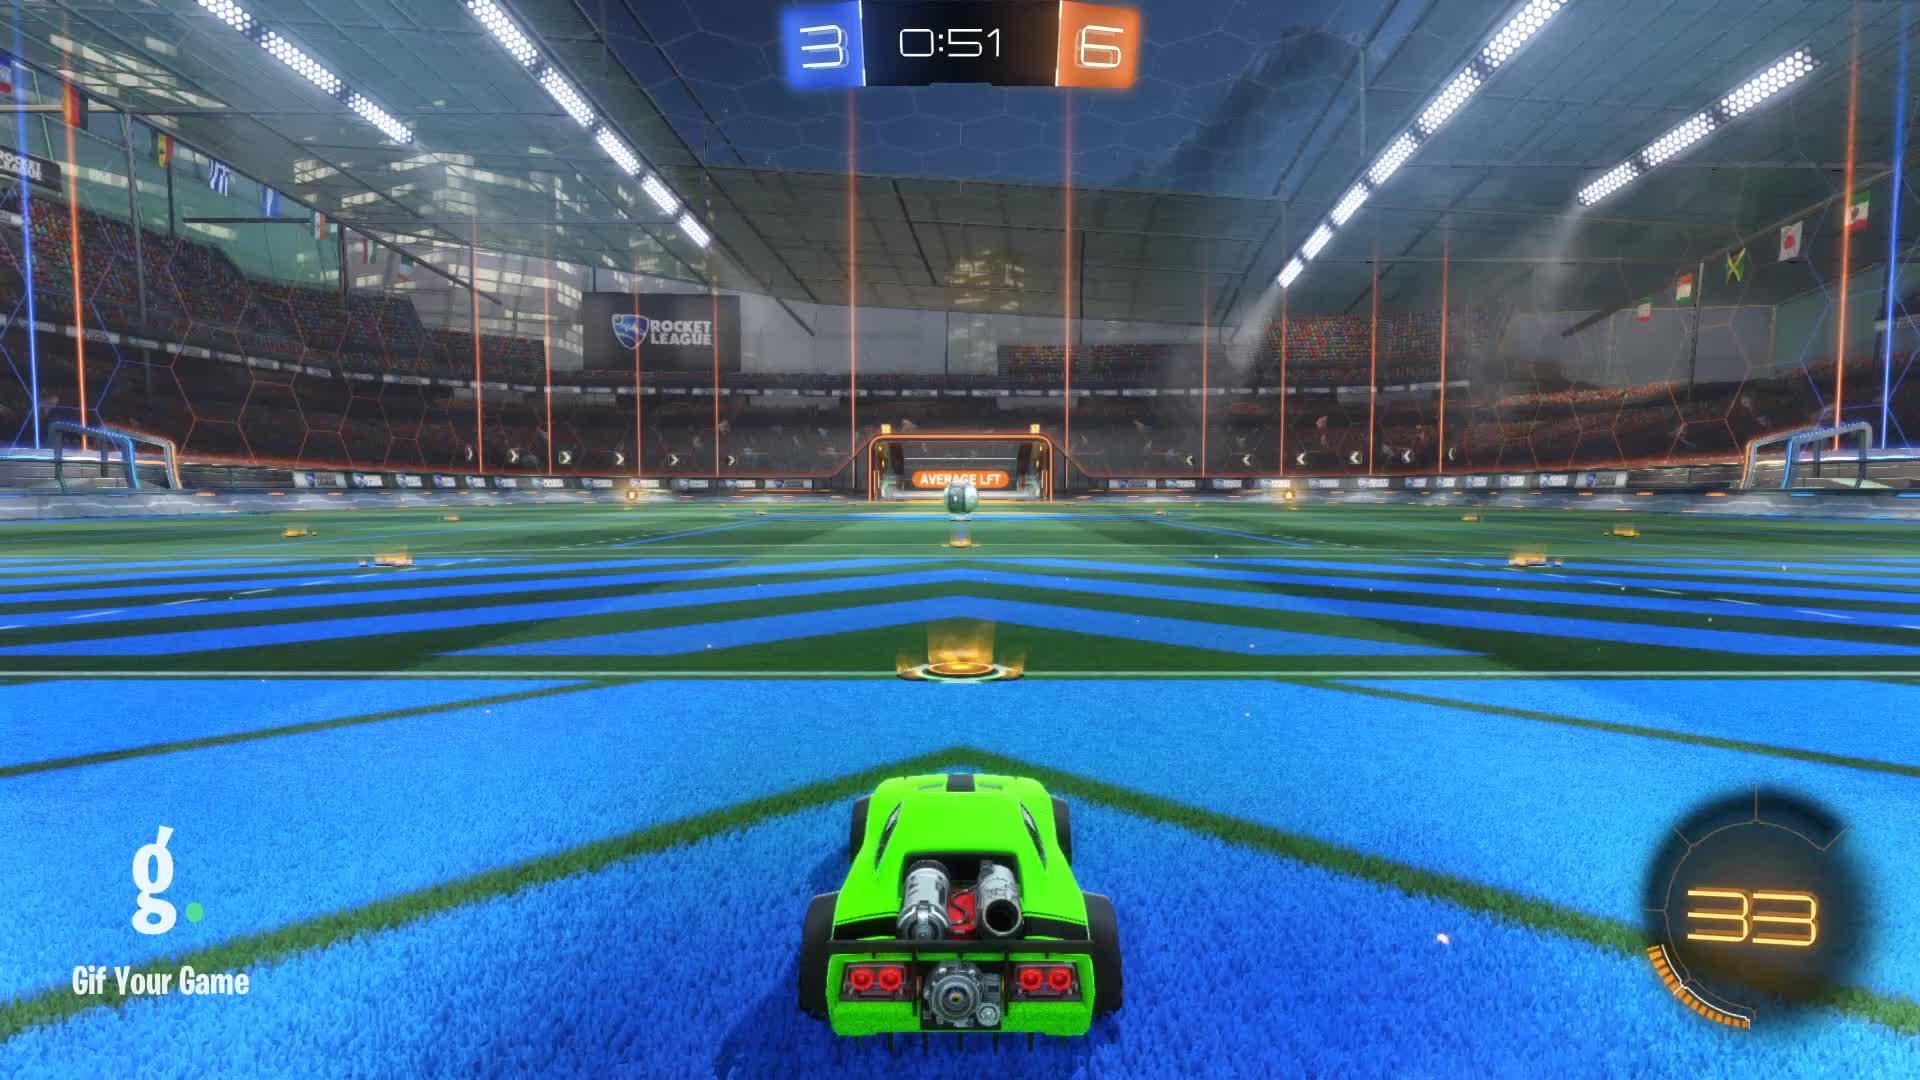 Gif Your Game, GifYourGame, Goal, Rocket League, RocketLeague, datboi, Goal 10: datboi GIFs